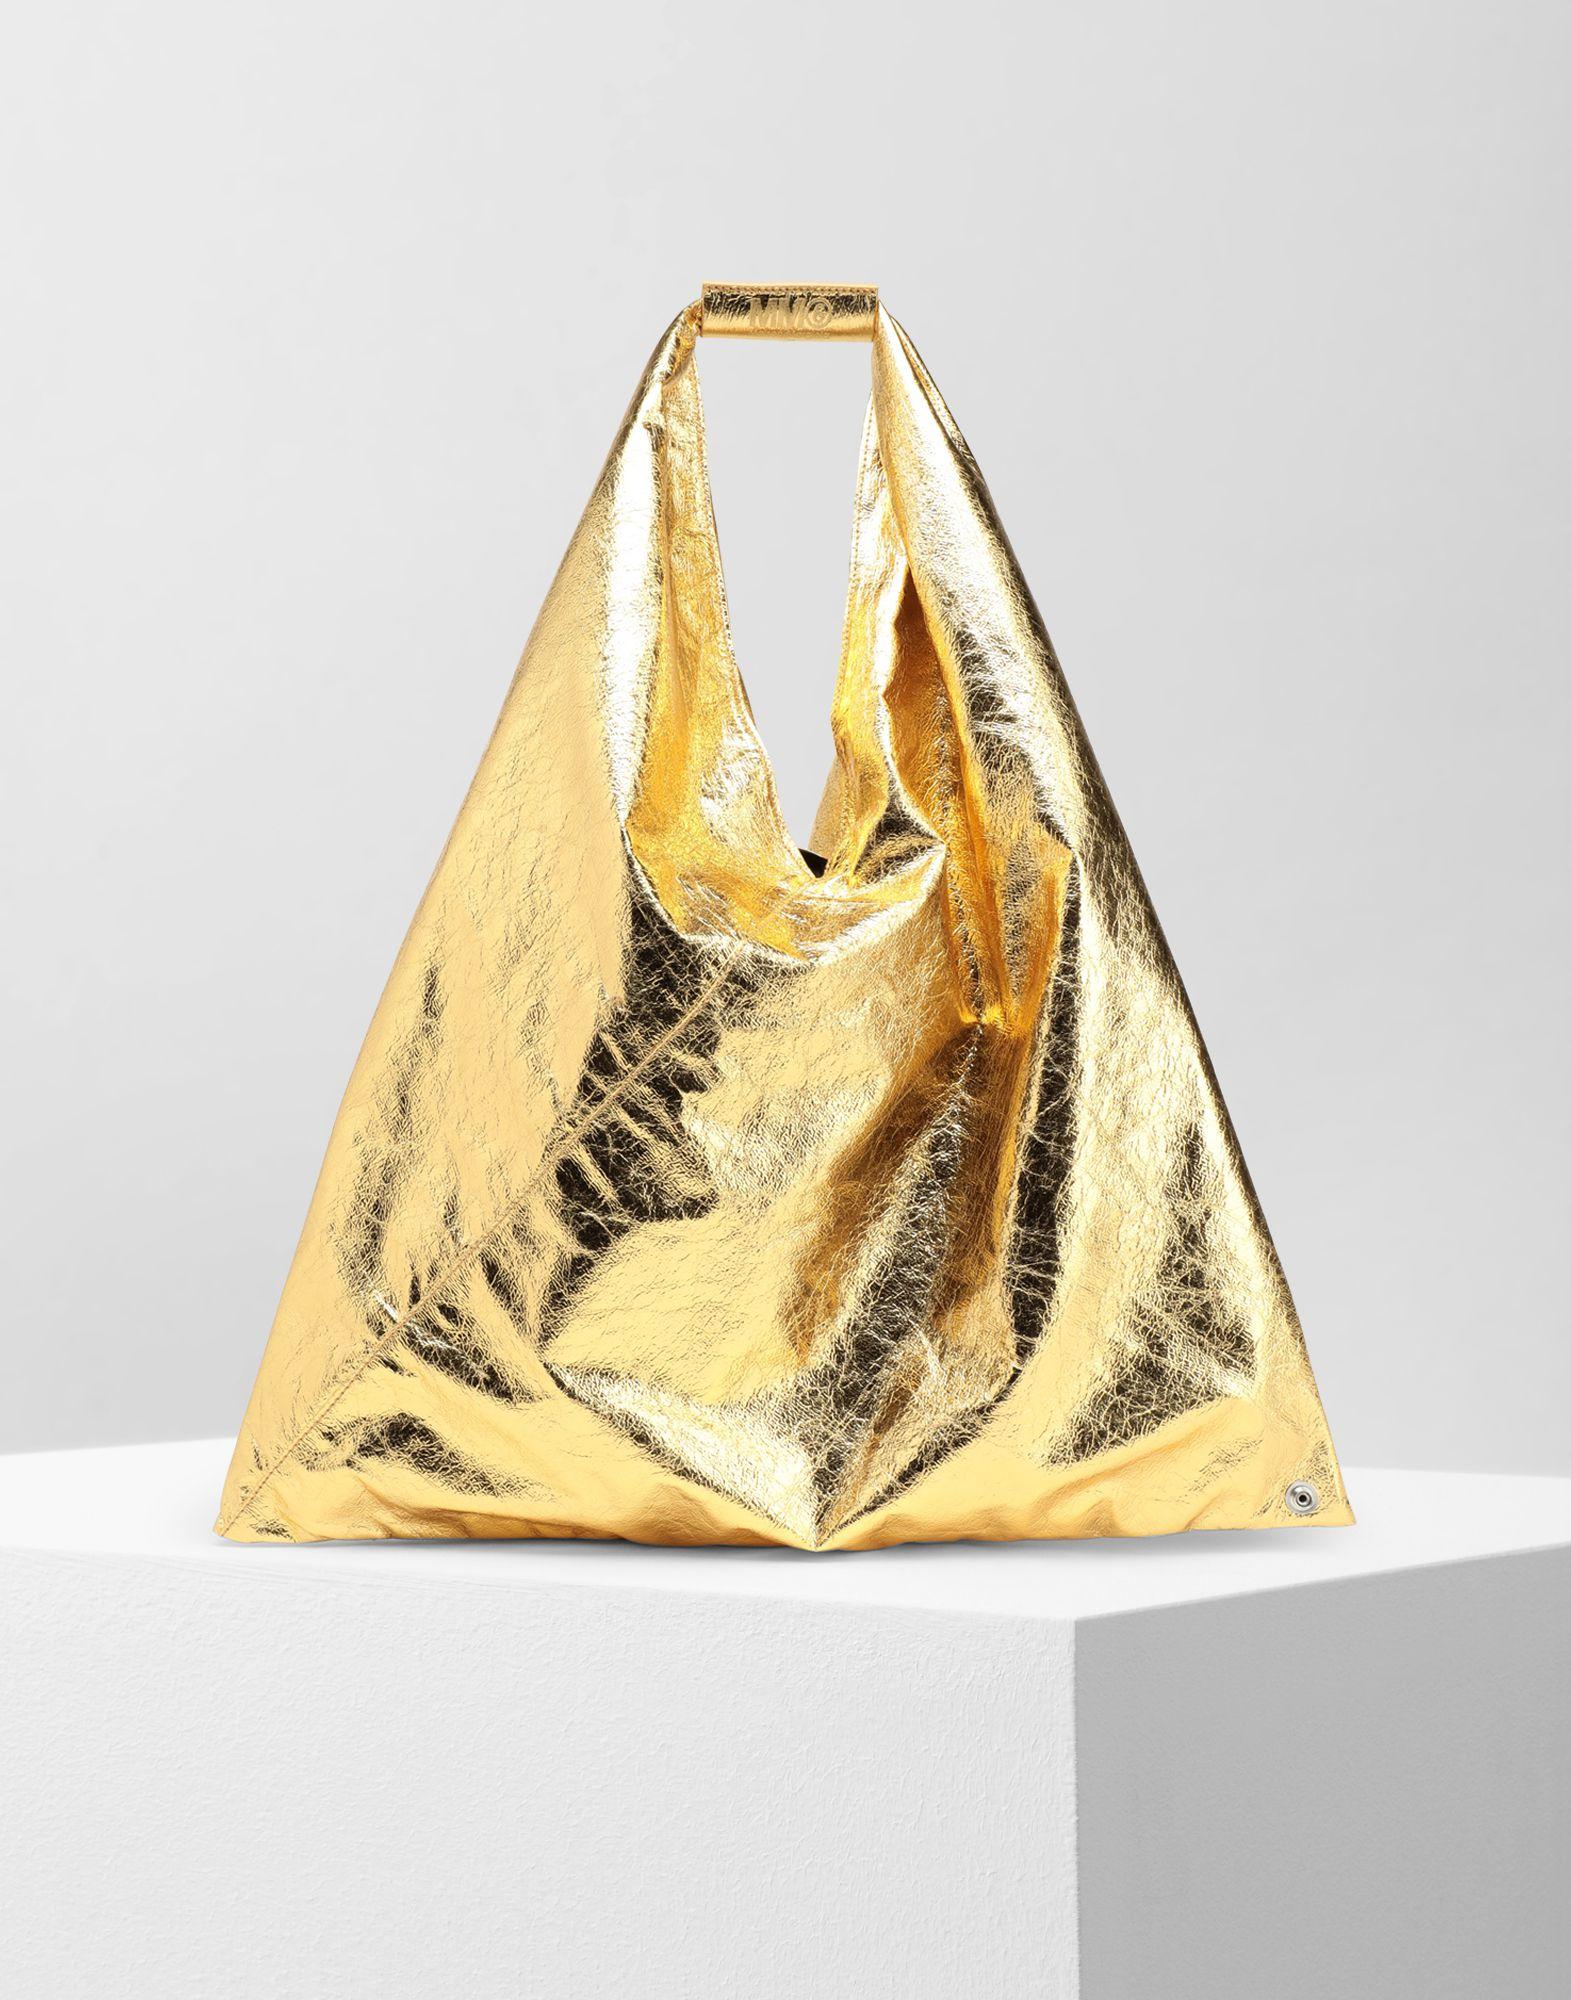 MM6 MAISON MARGIELA Japanese crinkled leather medium bag Tote Woman f